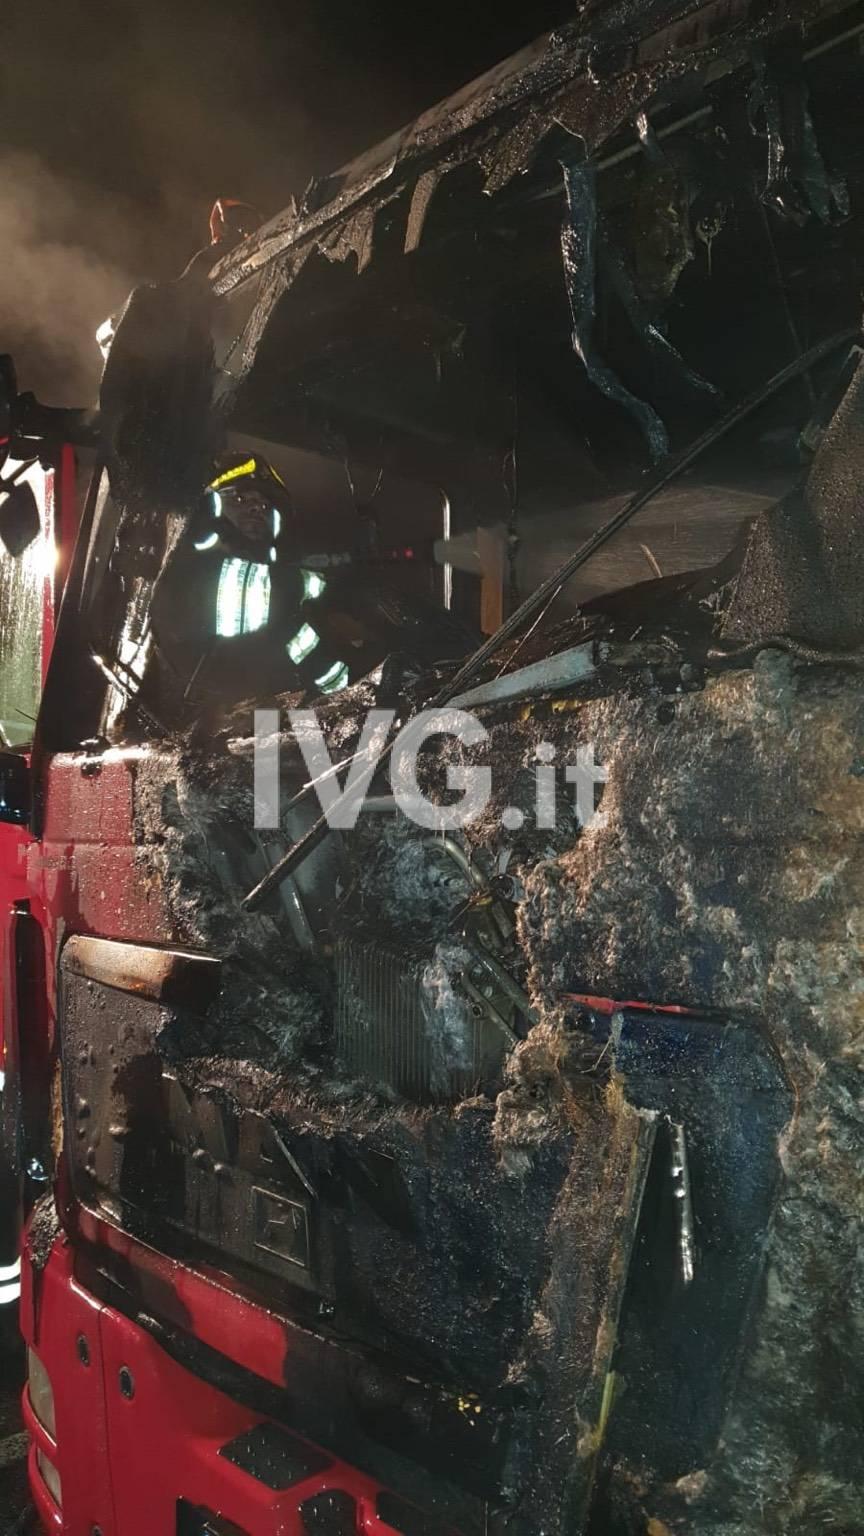 Camion autostrada fuoco incendio incidente vigili del fuoco